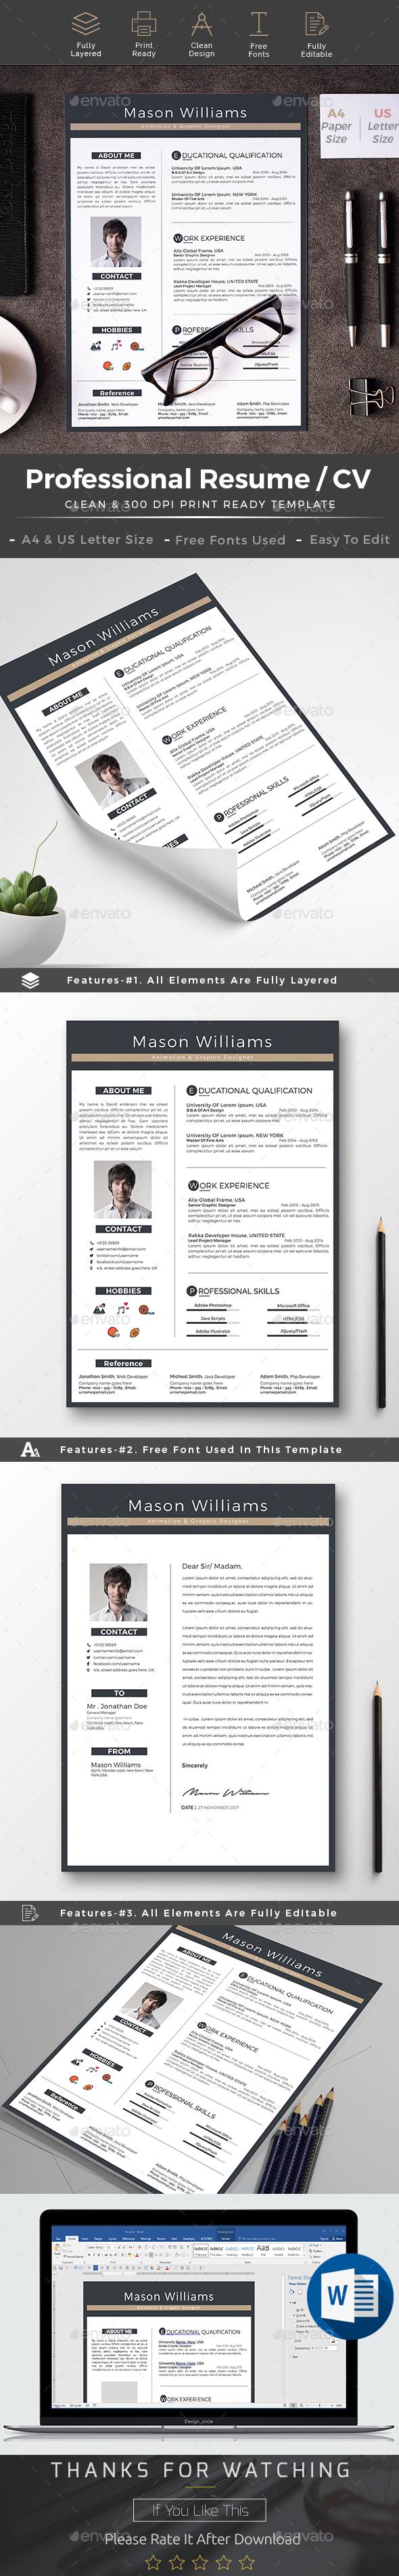 Resume cv word